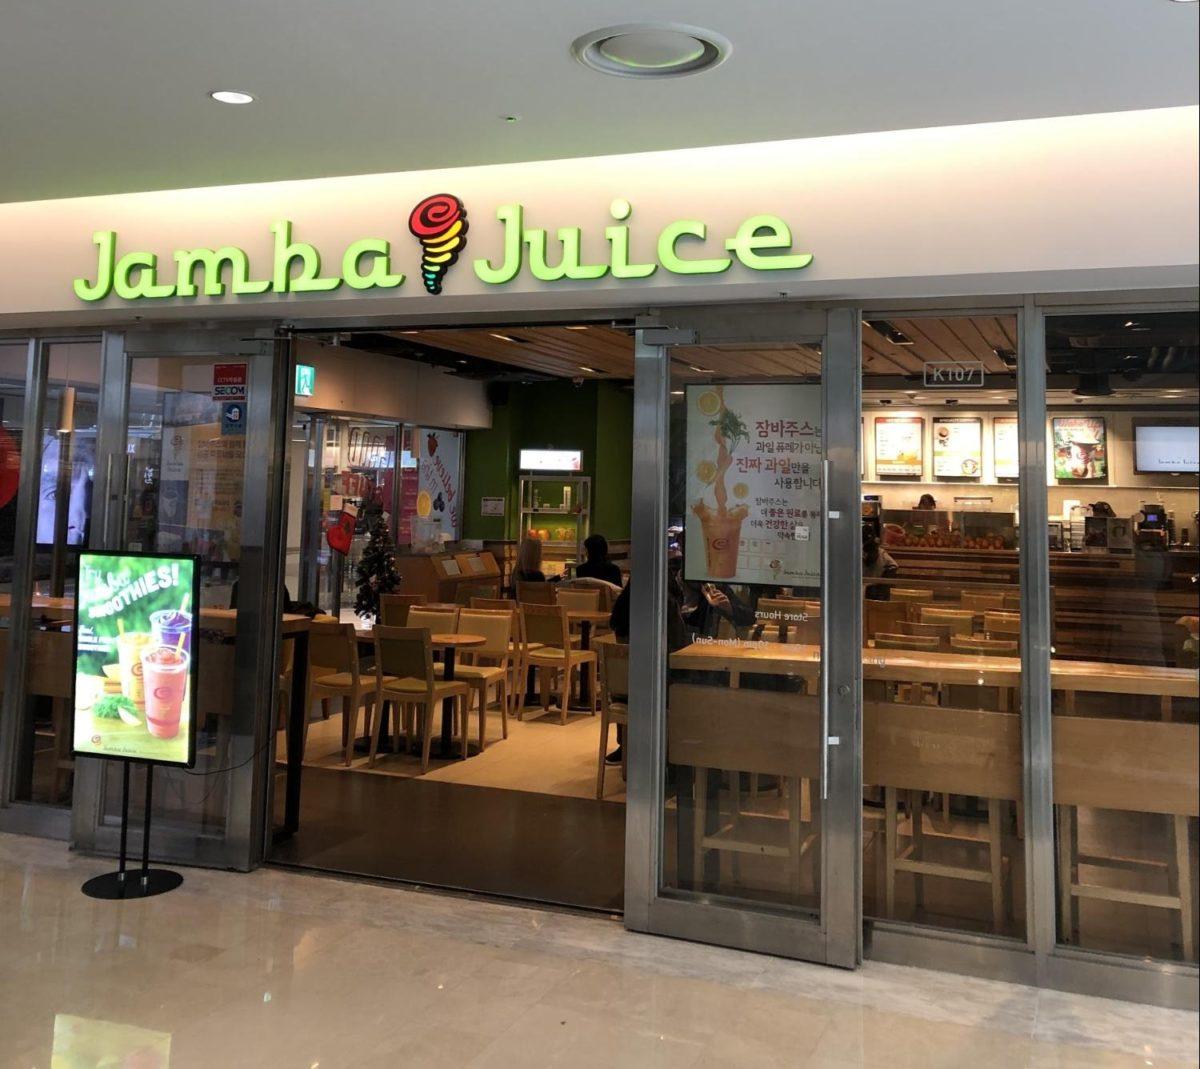 jamba juice(地下鉄2号線219 サムソン삼성駅・9号線929 ポンウンサ봉은사駅)